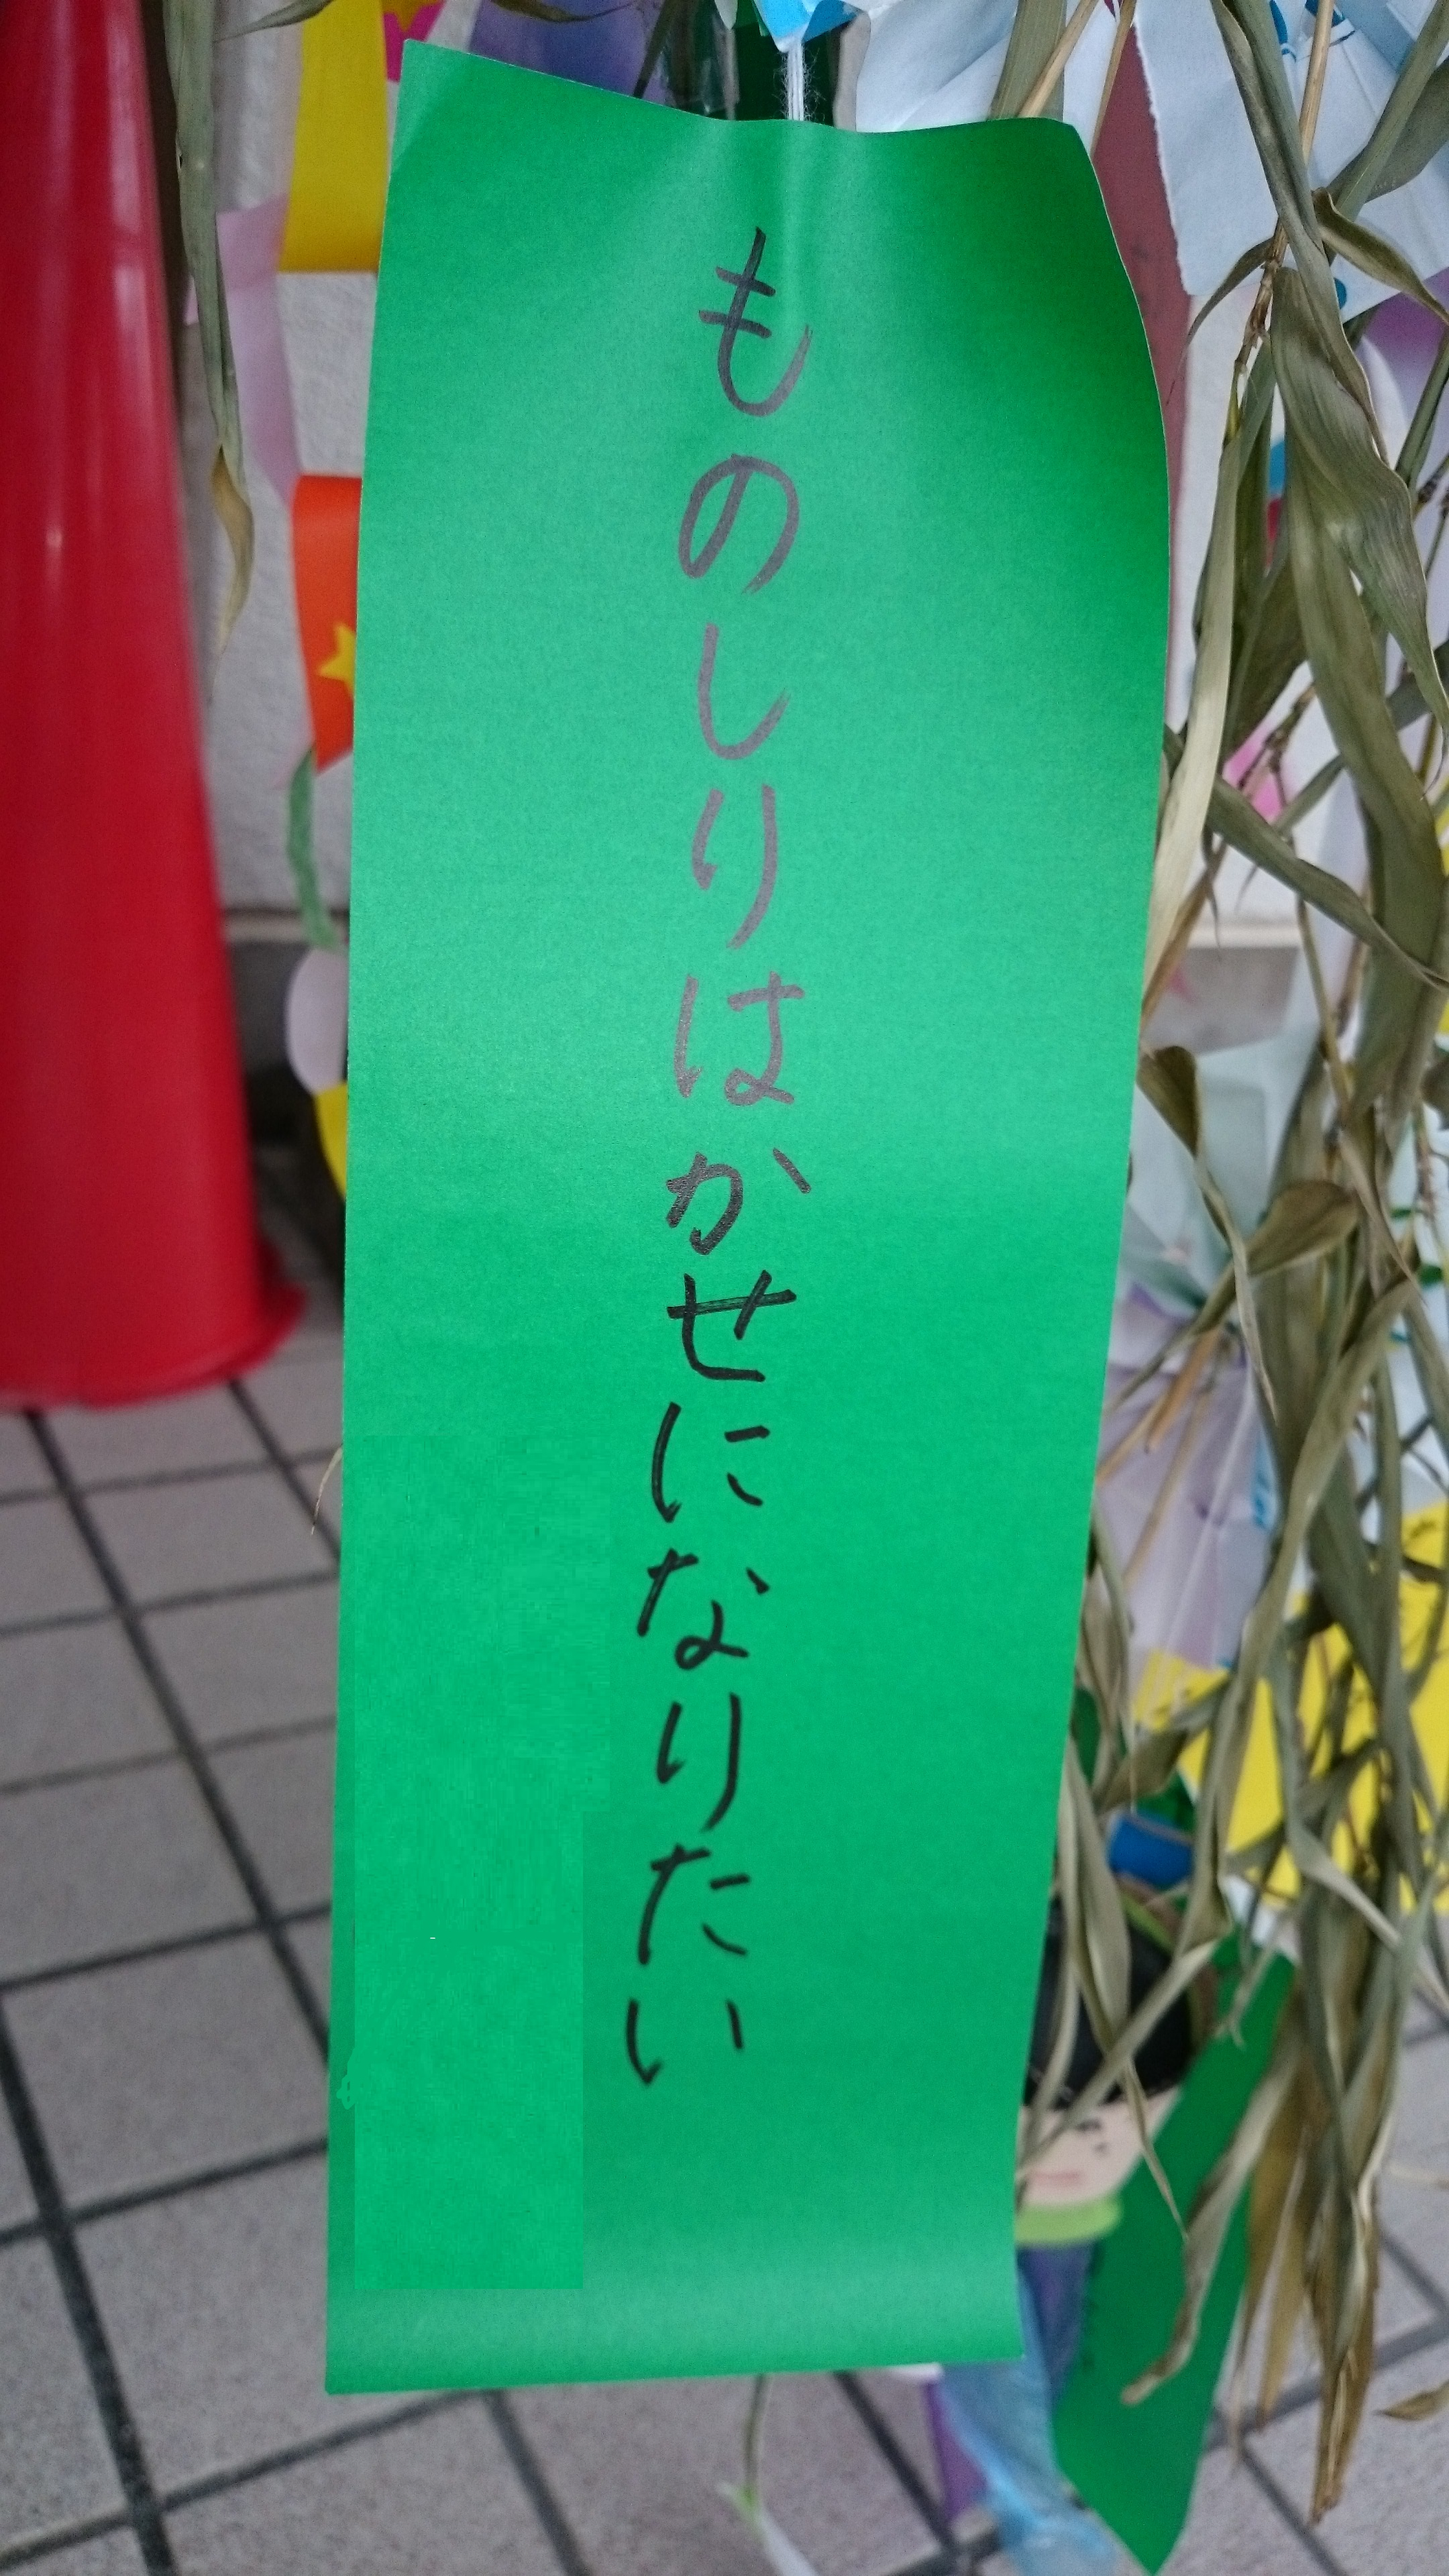 DSC_0448 - コピー.JPG